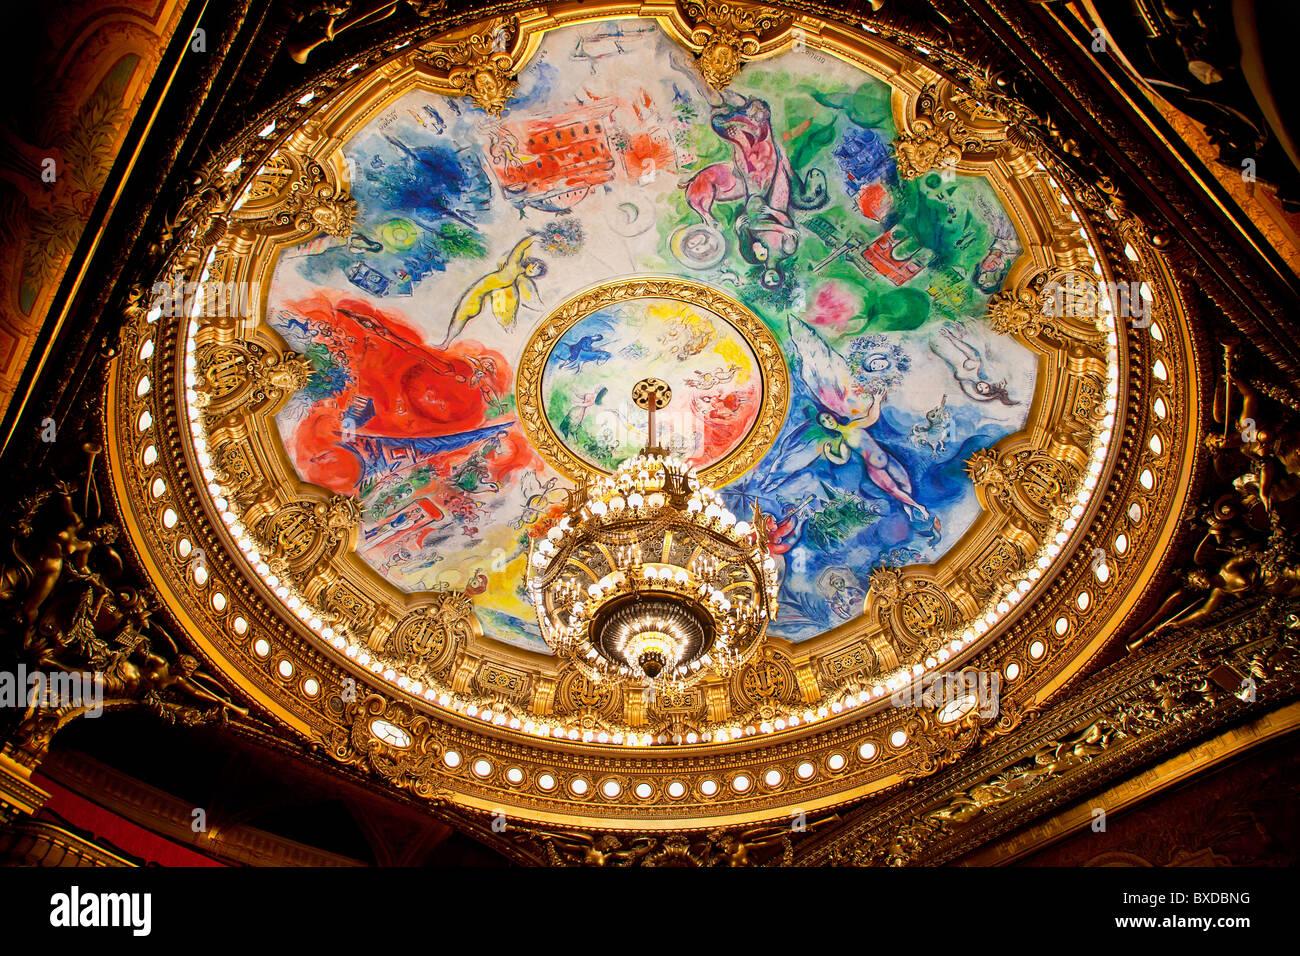 Opera National de Paris - Palais Garnier The ceiling of the Garnier opera house was painted by artist Marc Chagall - Stock Image